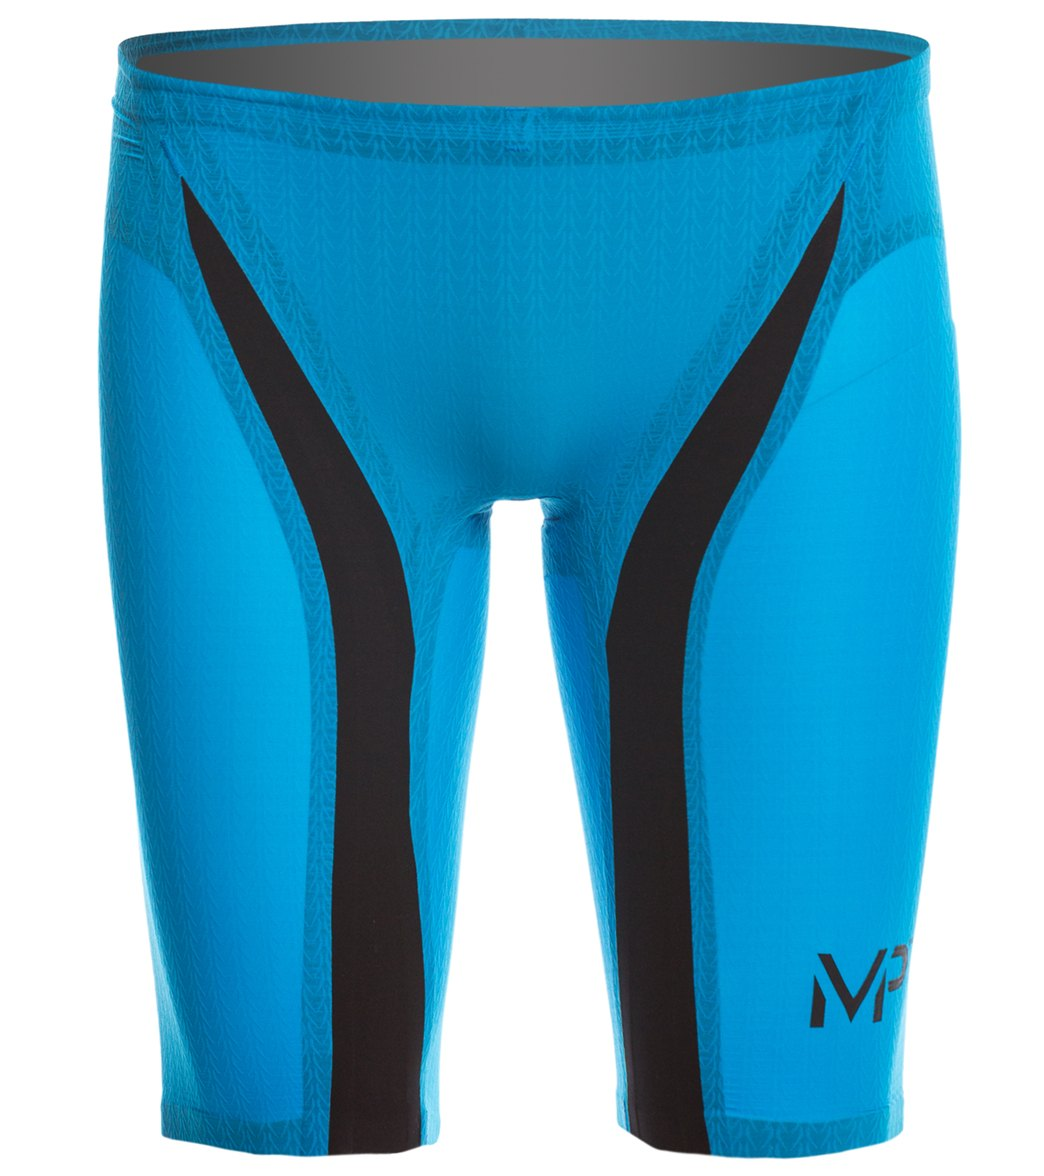 4c66fb189f MP Michael Phelps Xpresso Jammer Tech Suit Swimsuit at SwimOutlet ...